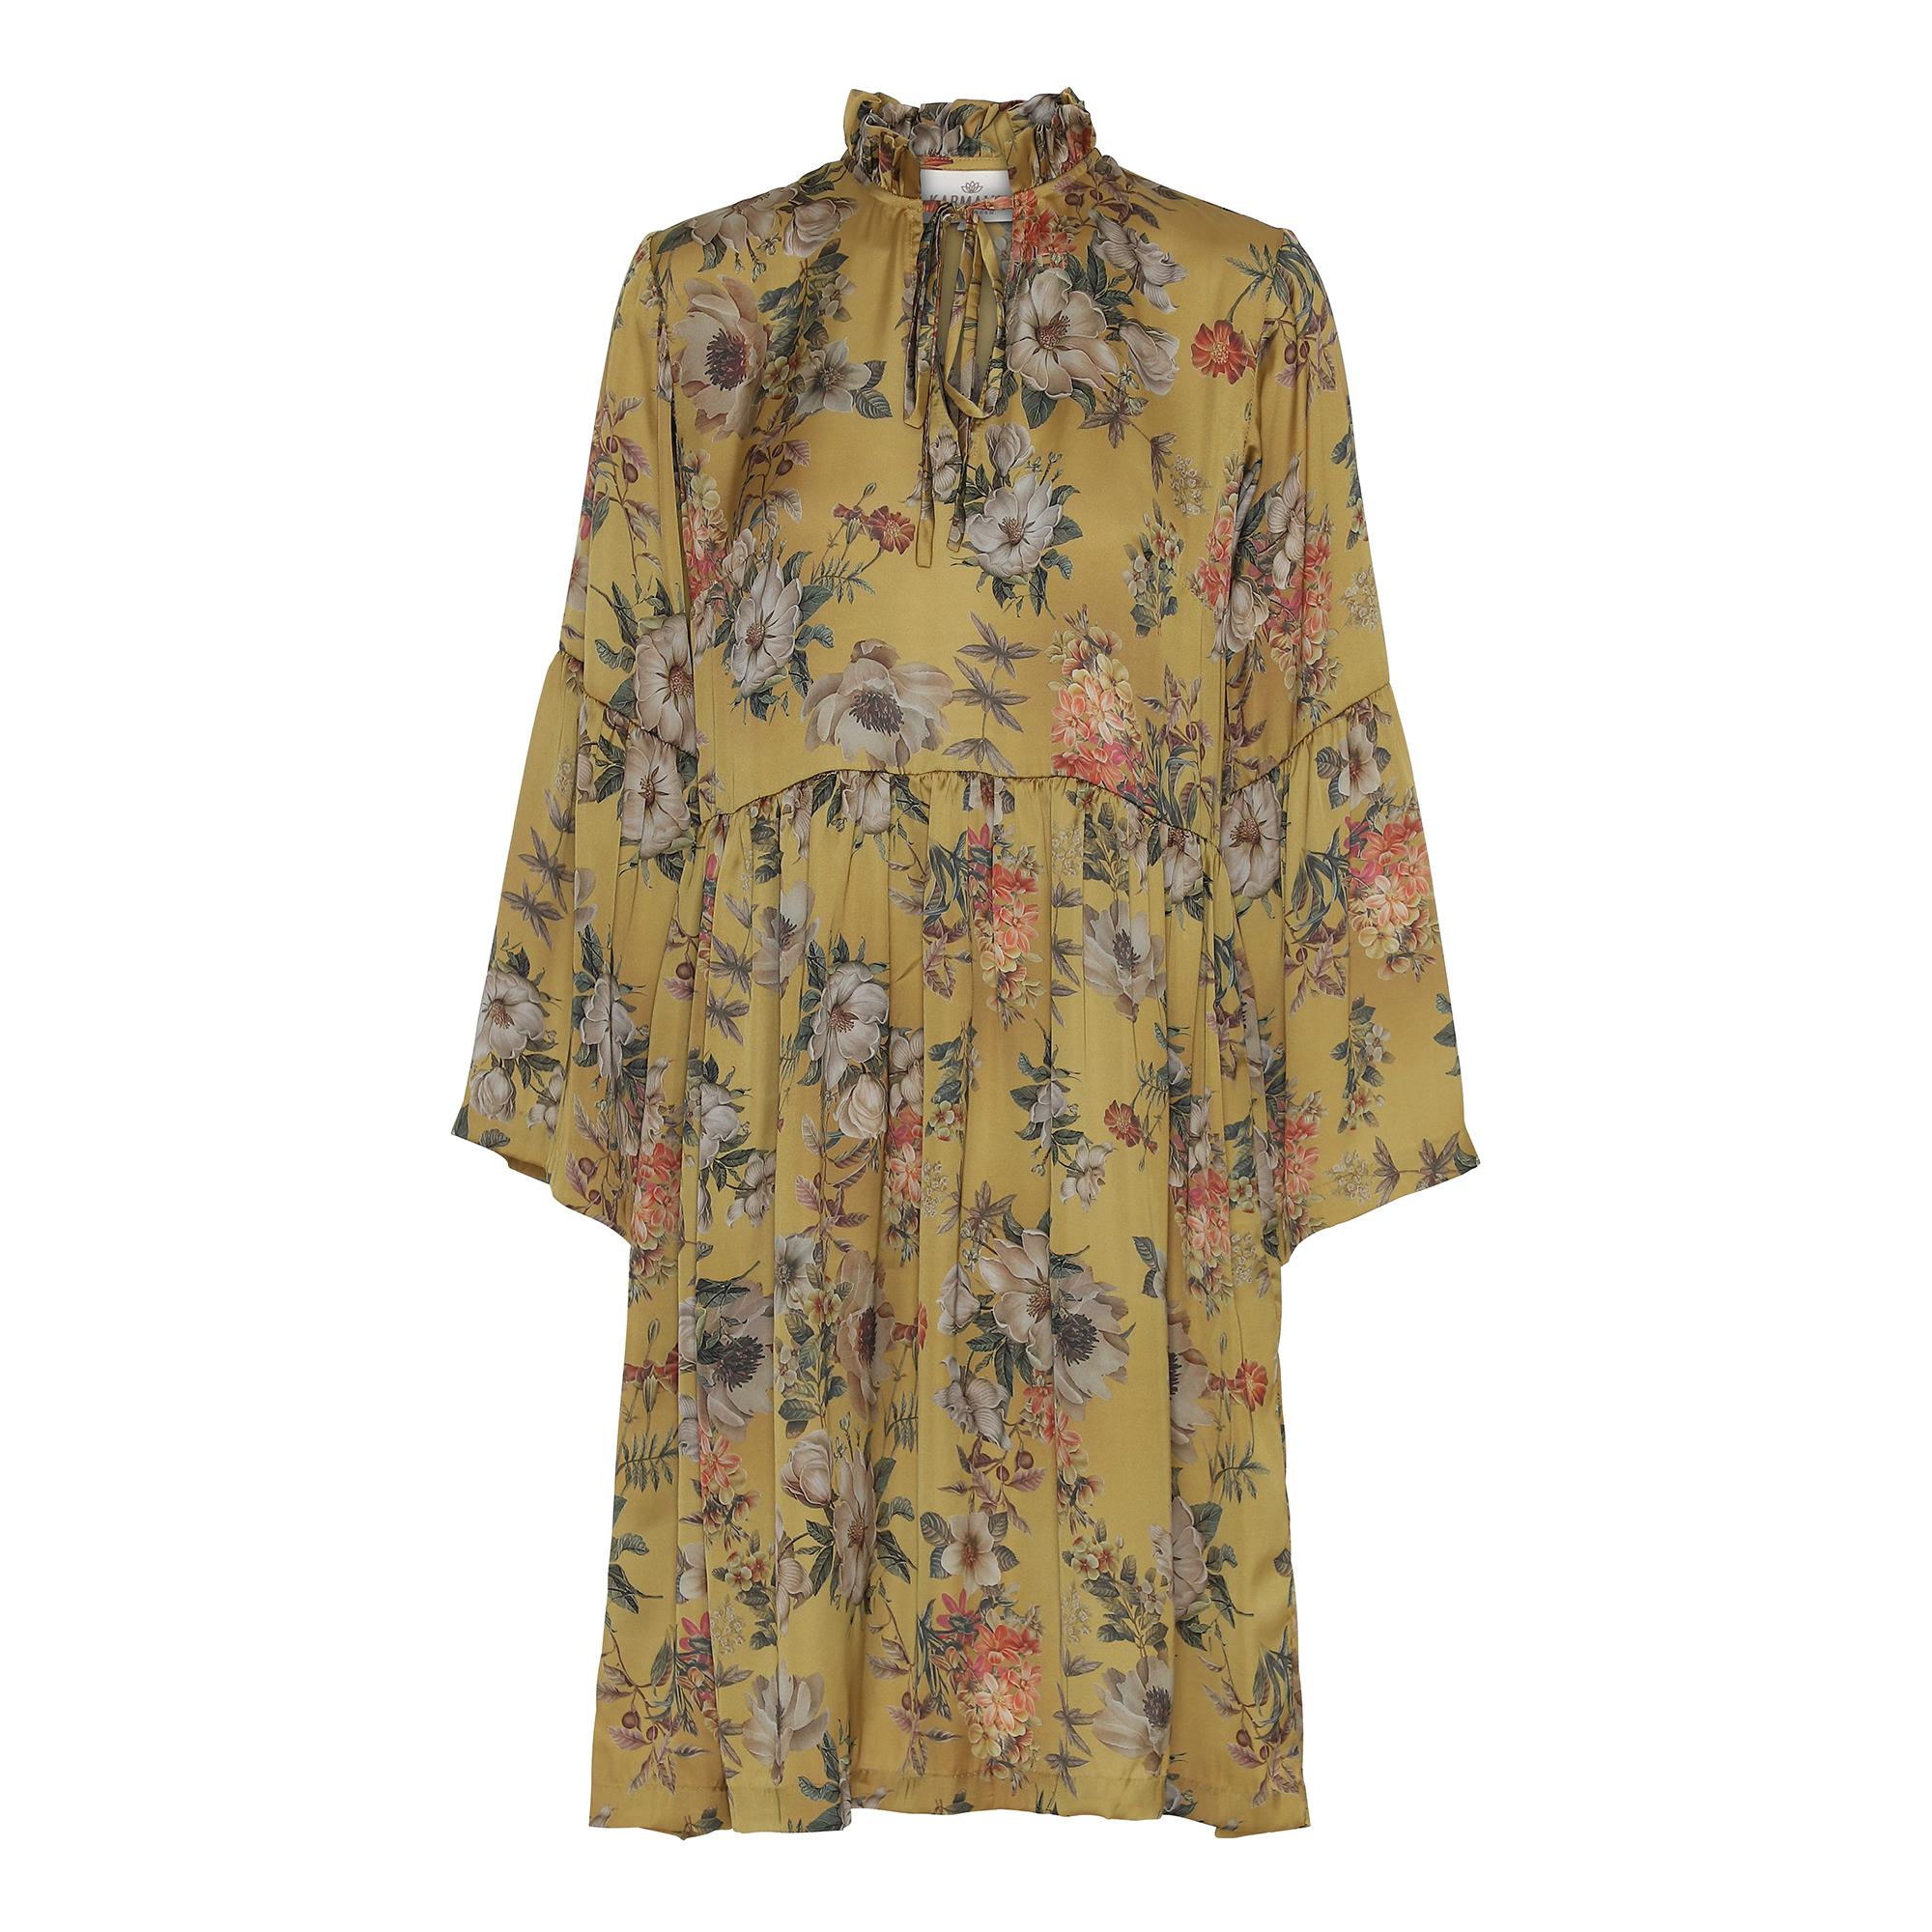 Kenya dress